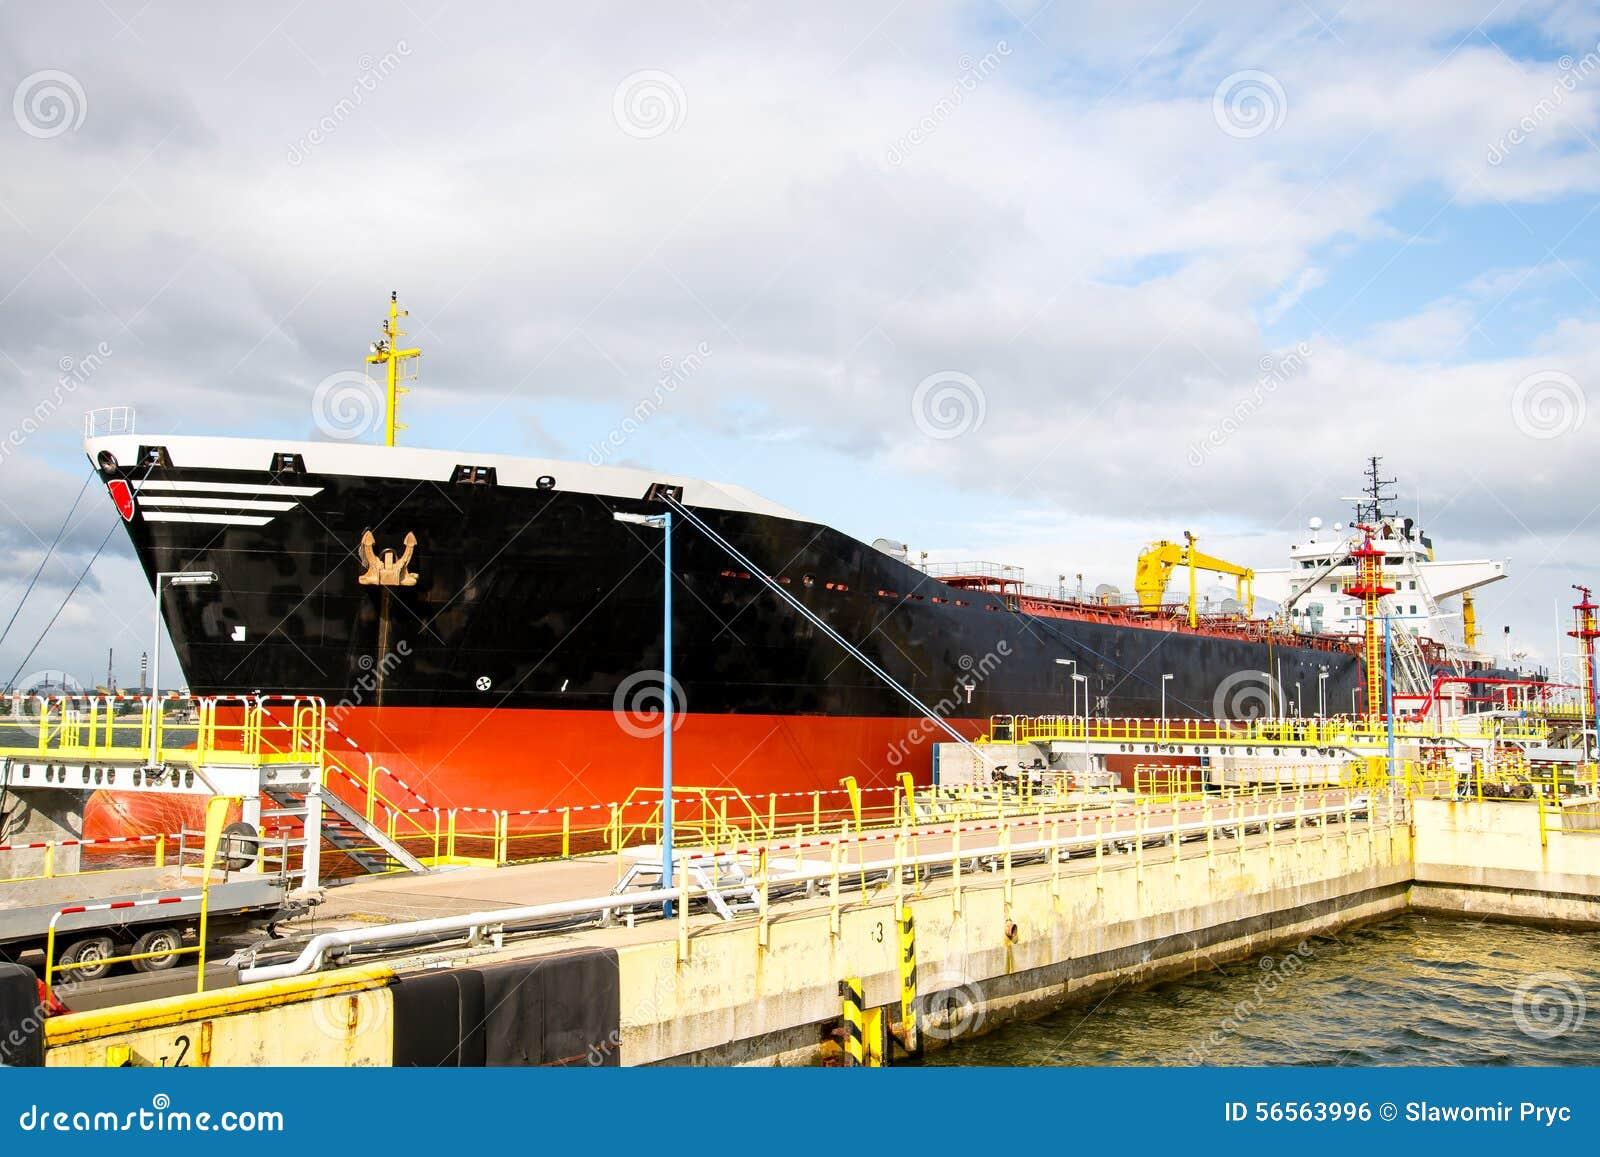 Download Εκφόρτωση ενός σκάφους βυτιοφόρων Στοκ Εικόνες - εικόνα από θάλασσα, ημέρα: 56563996